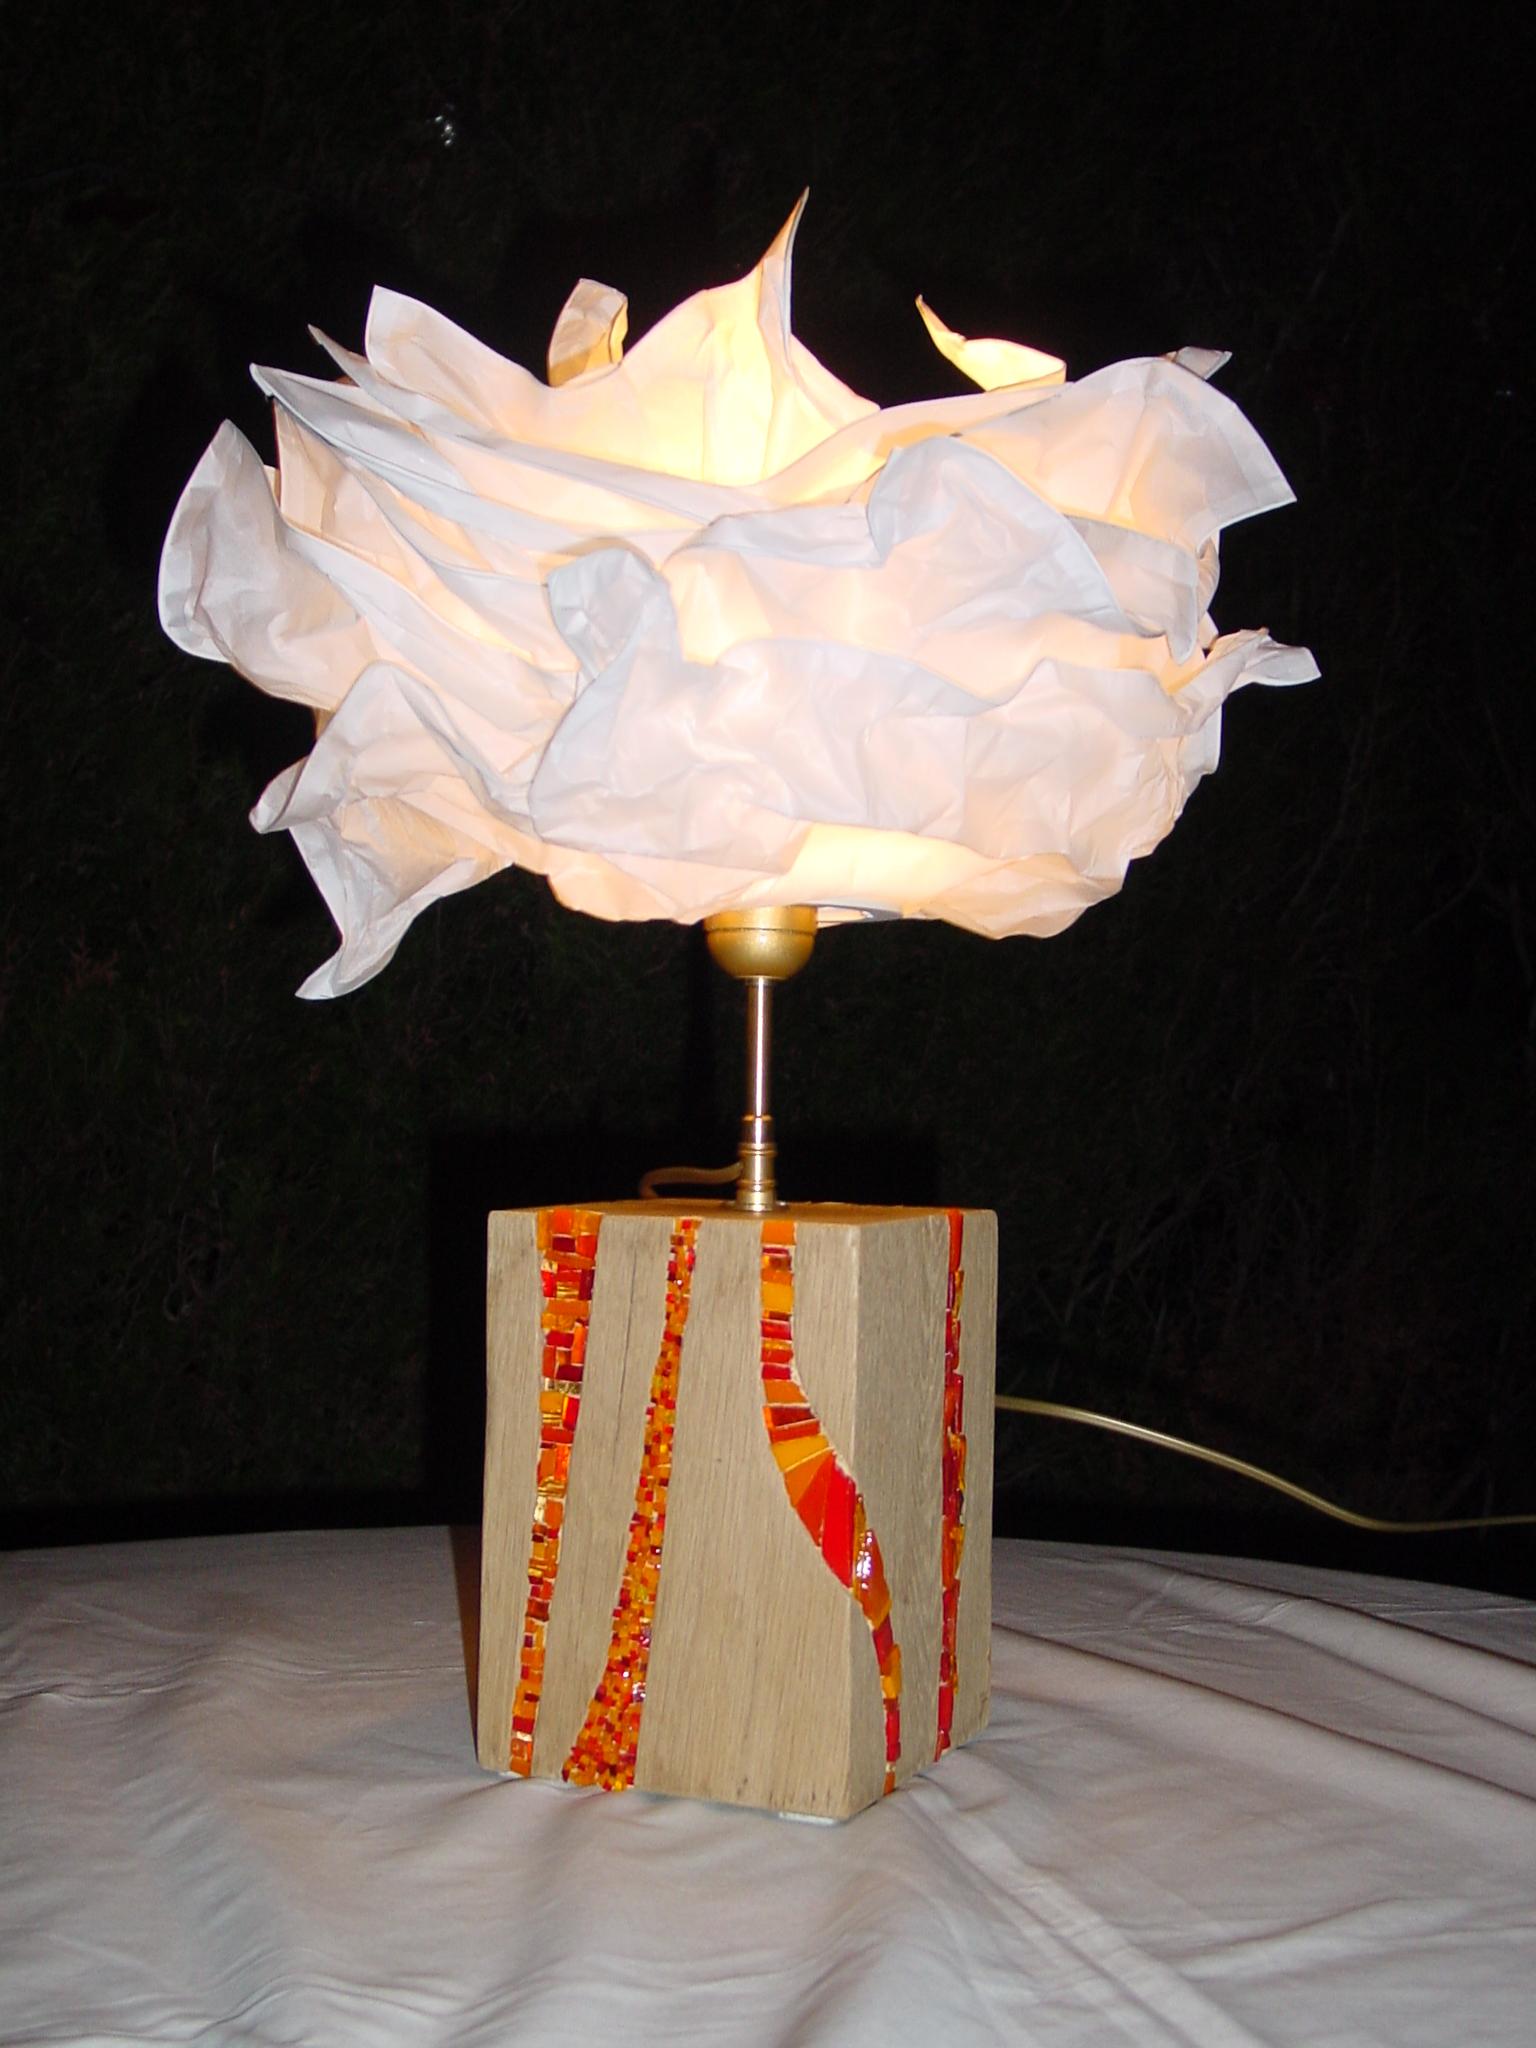 Lampe en chêne et incrustations de verre